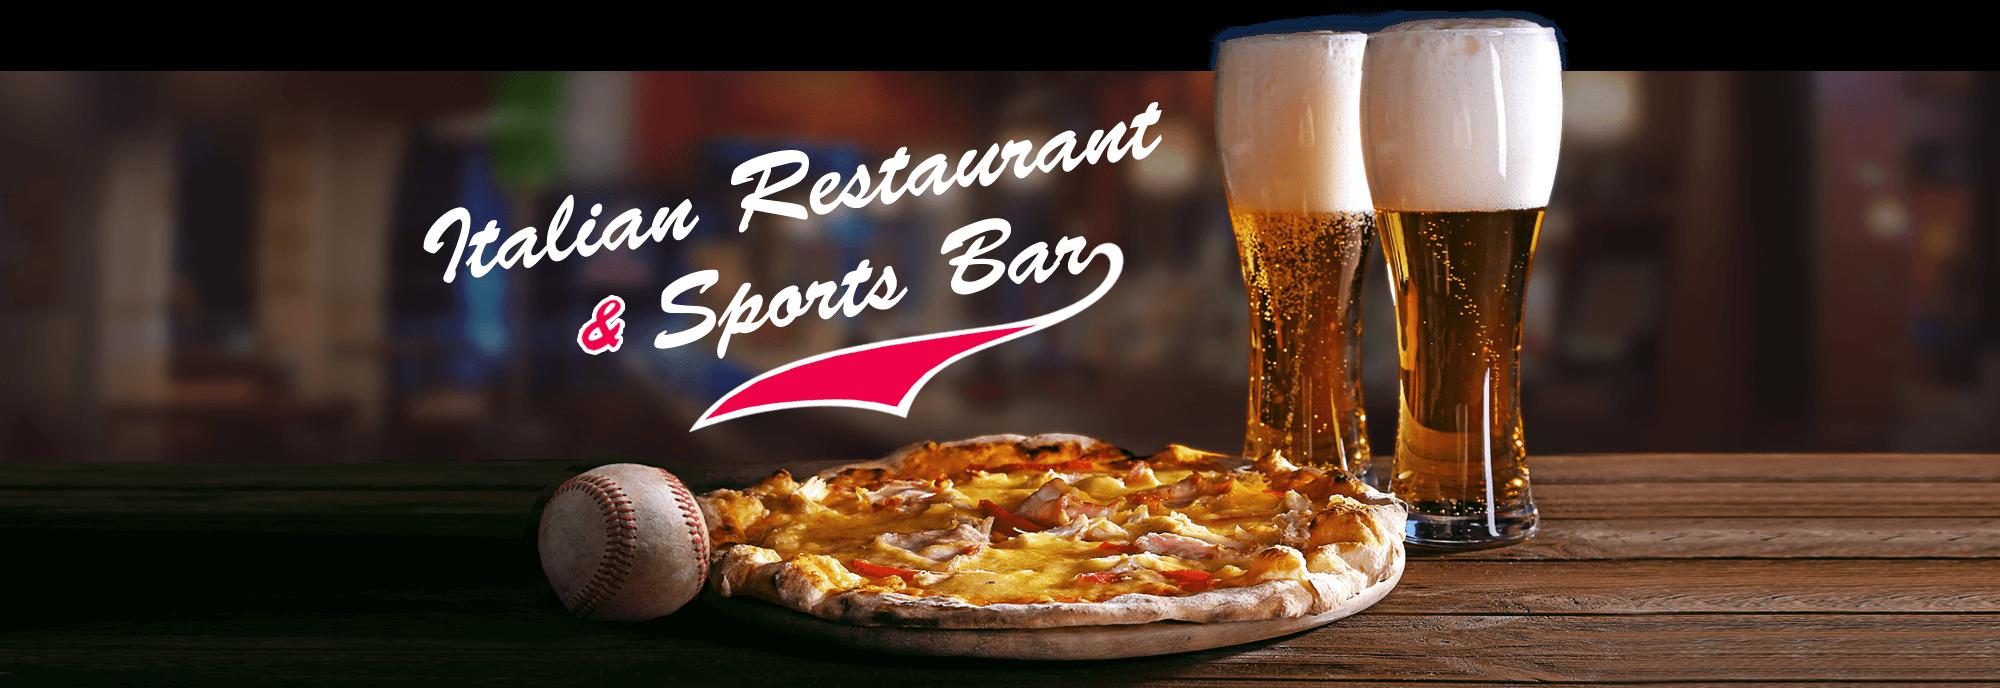 Italian Restaurant & Sports Bar